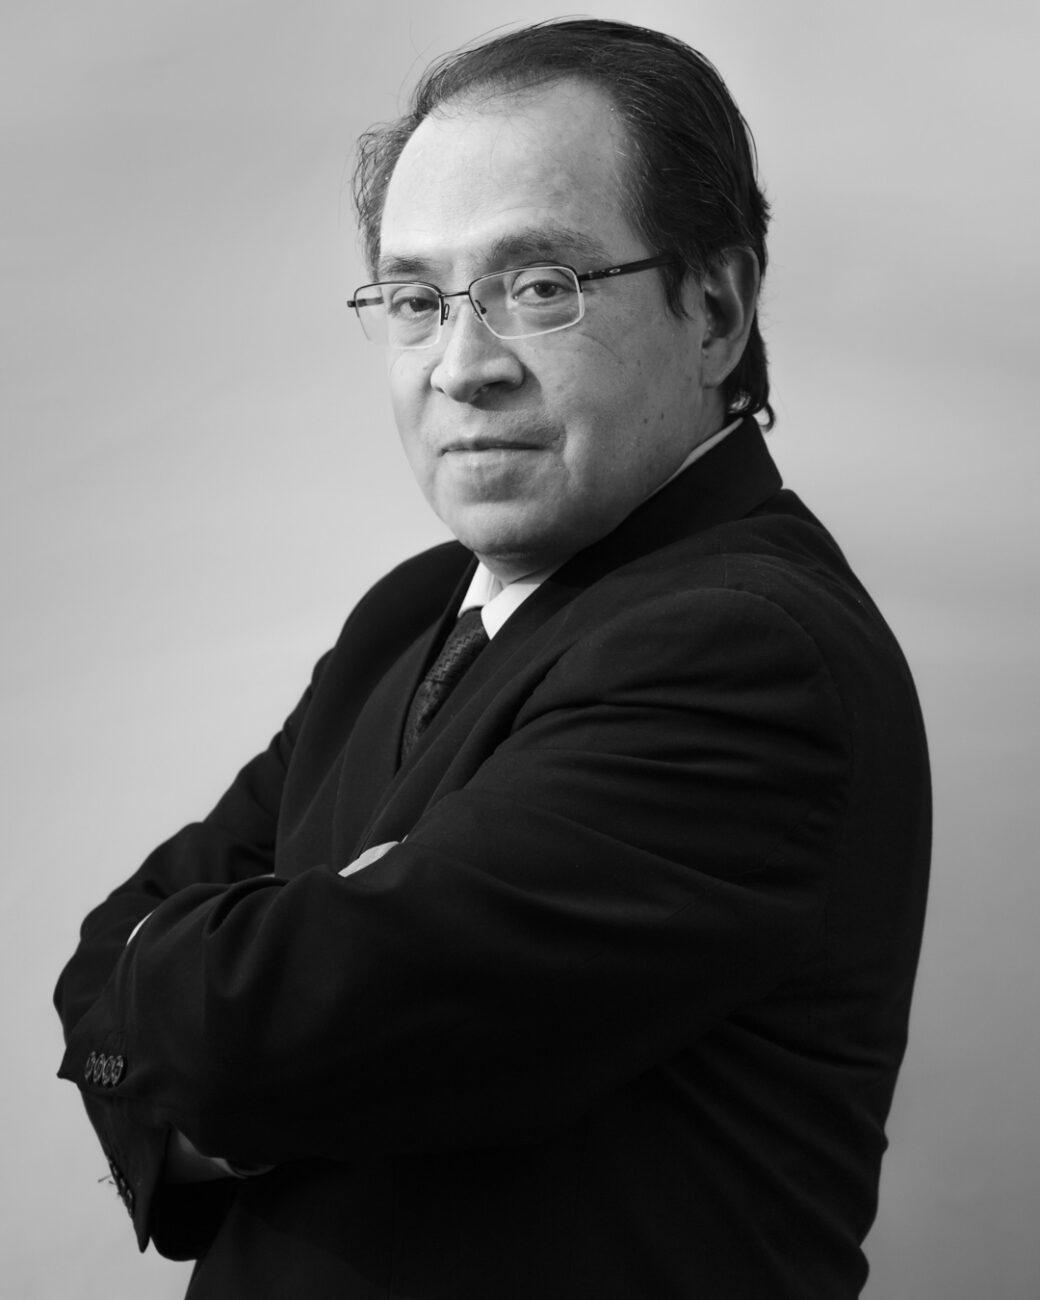 FRANCISCO LEOBARDO GOMEZ VIQUEZ